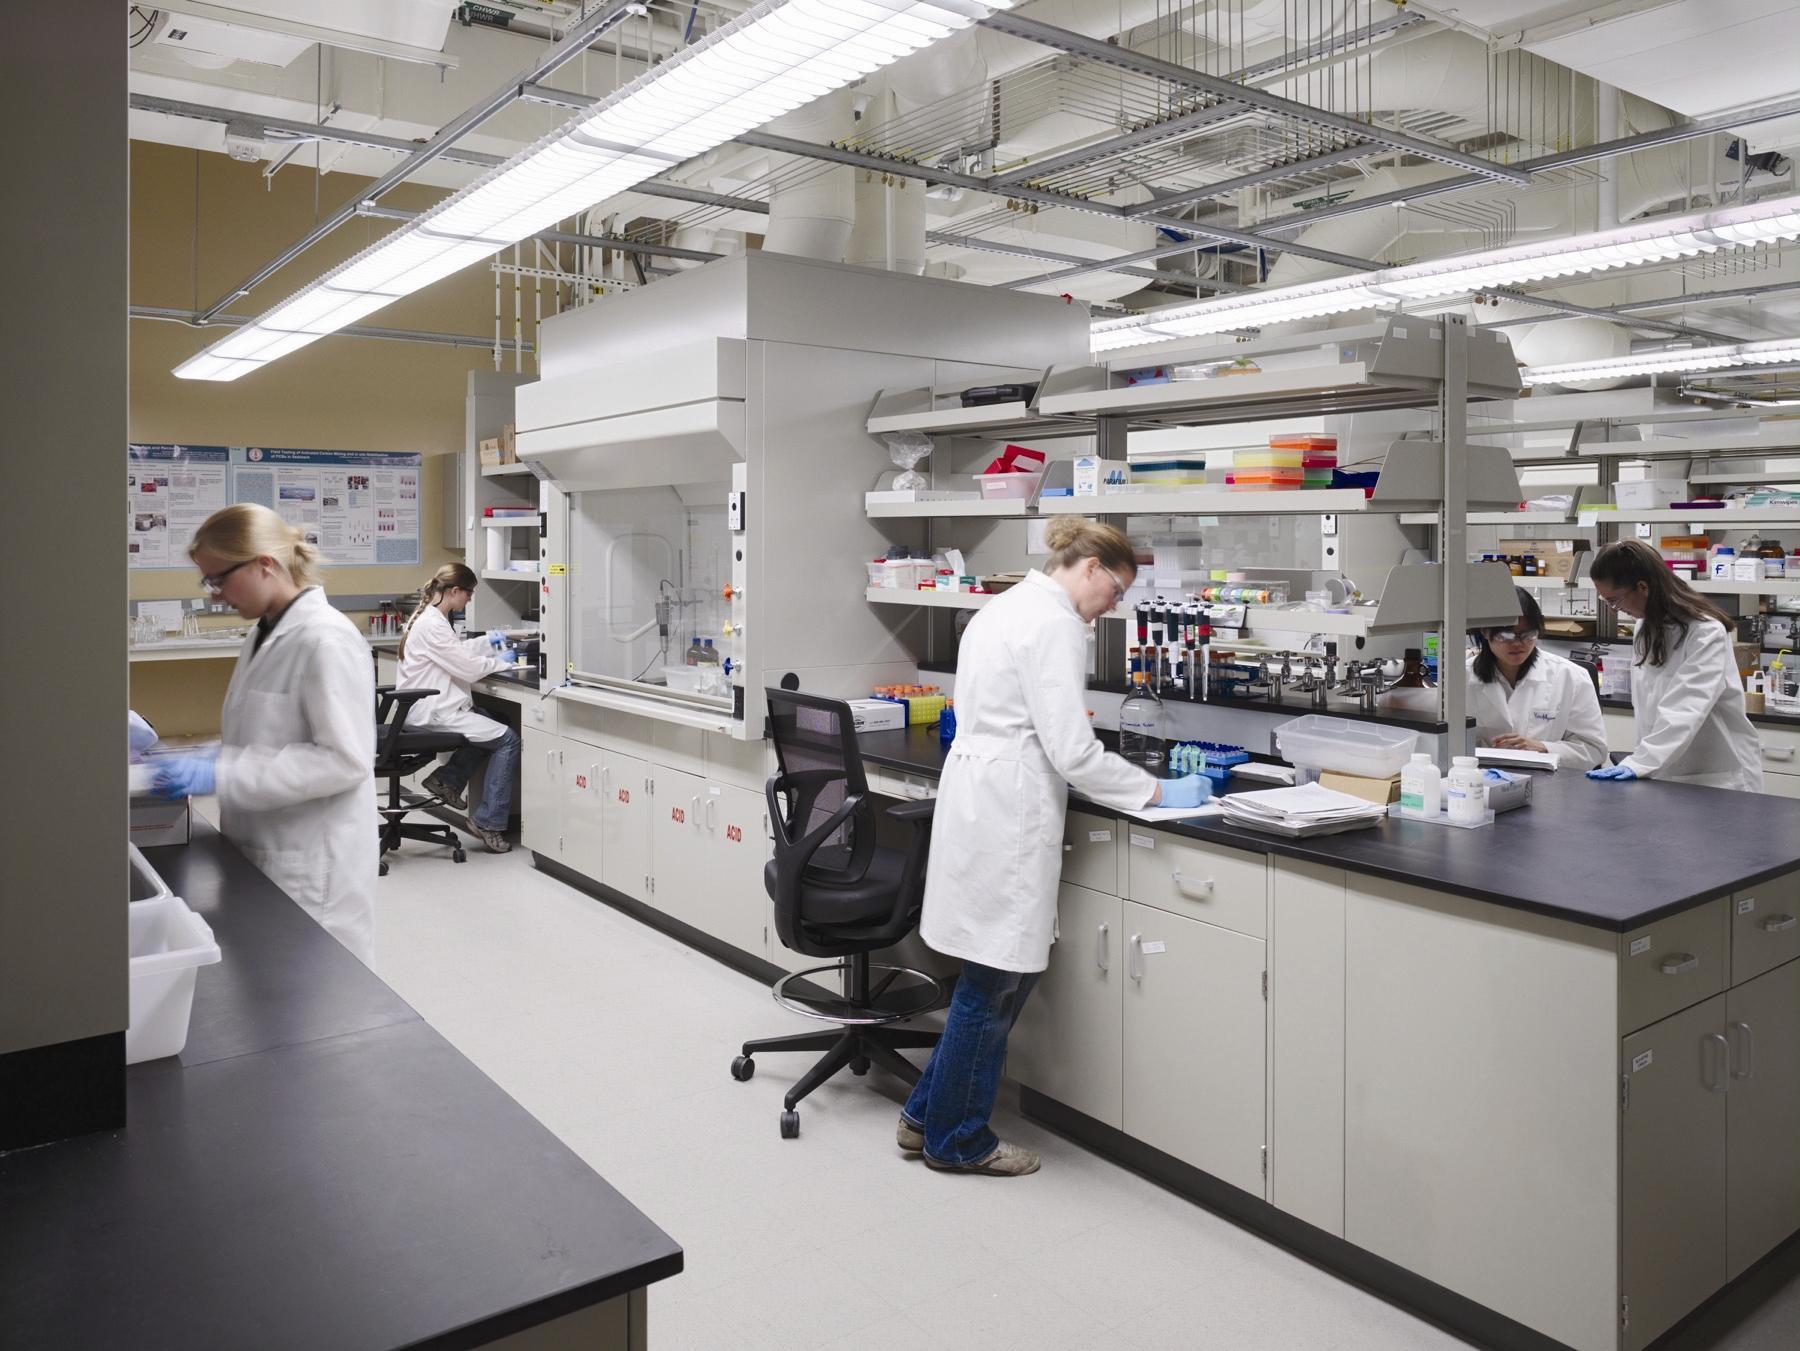 Scientific metal fabrication services